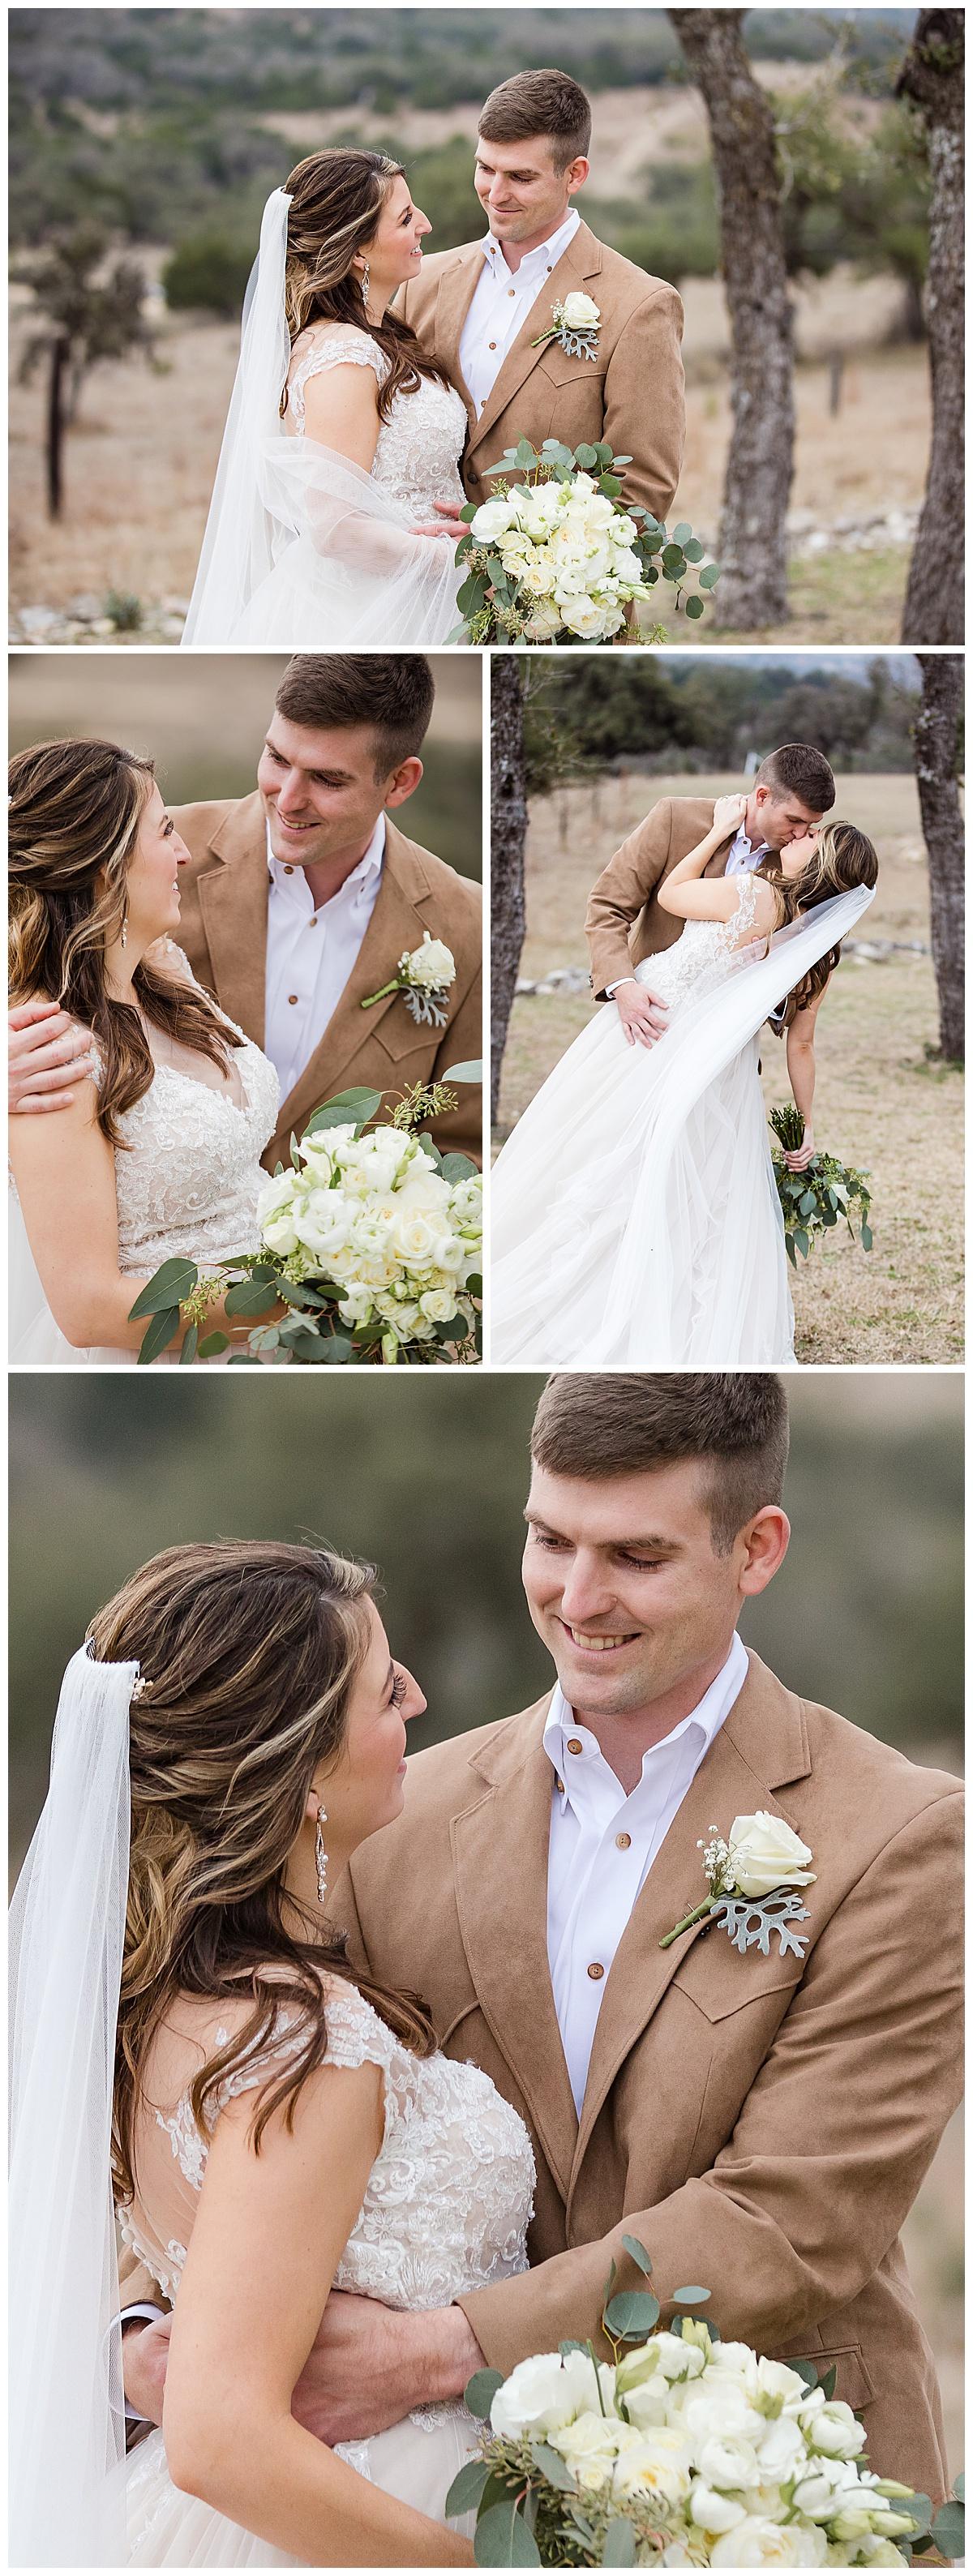 Wedding-Photographer-Texas-Hill-Country-Happy-H-Ranch-Comfor-Texas-Carly-Barton-Photography_0049.jpg